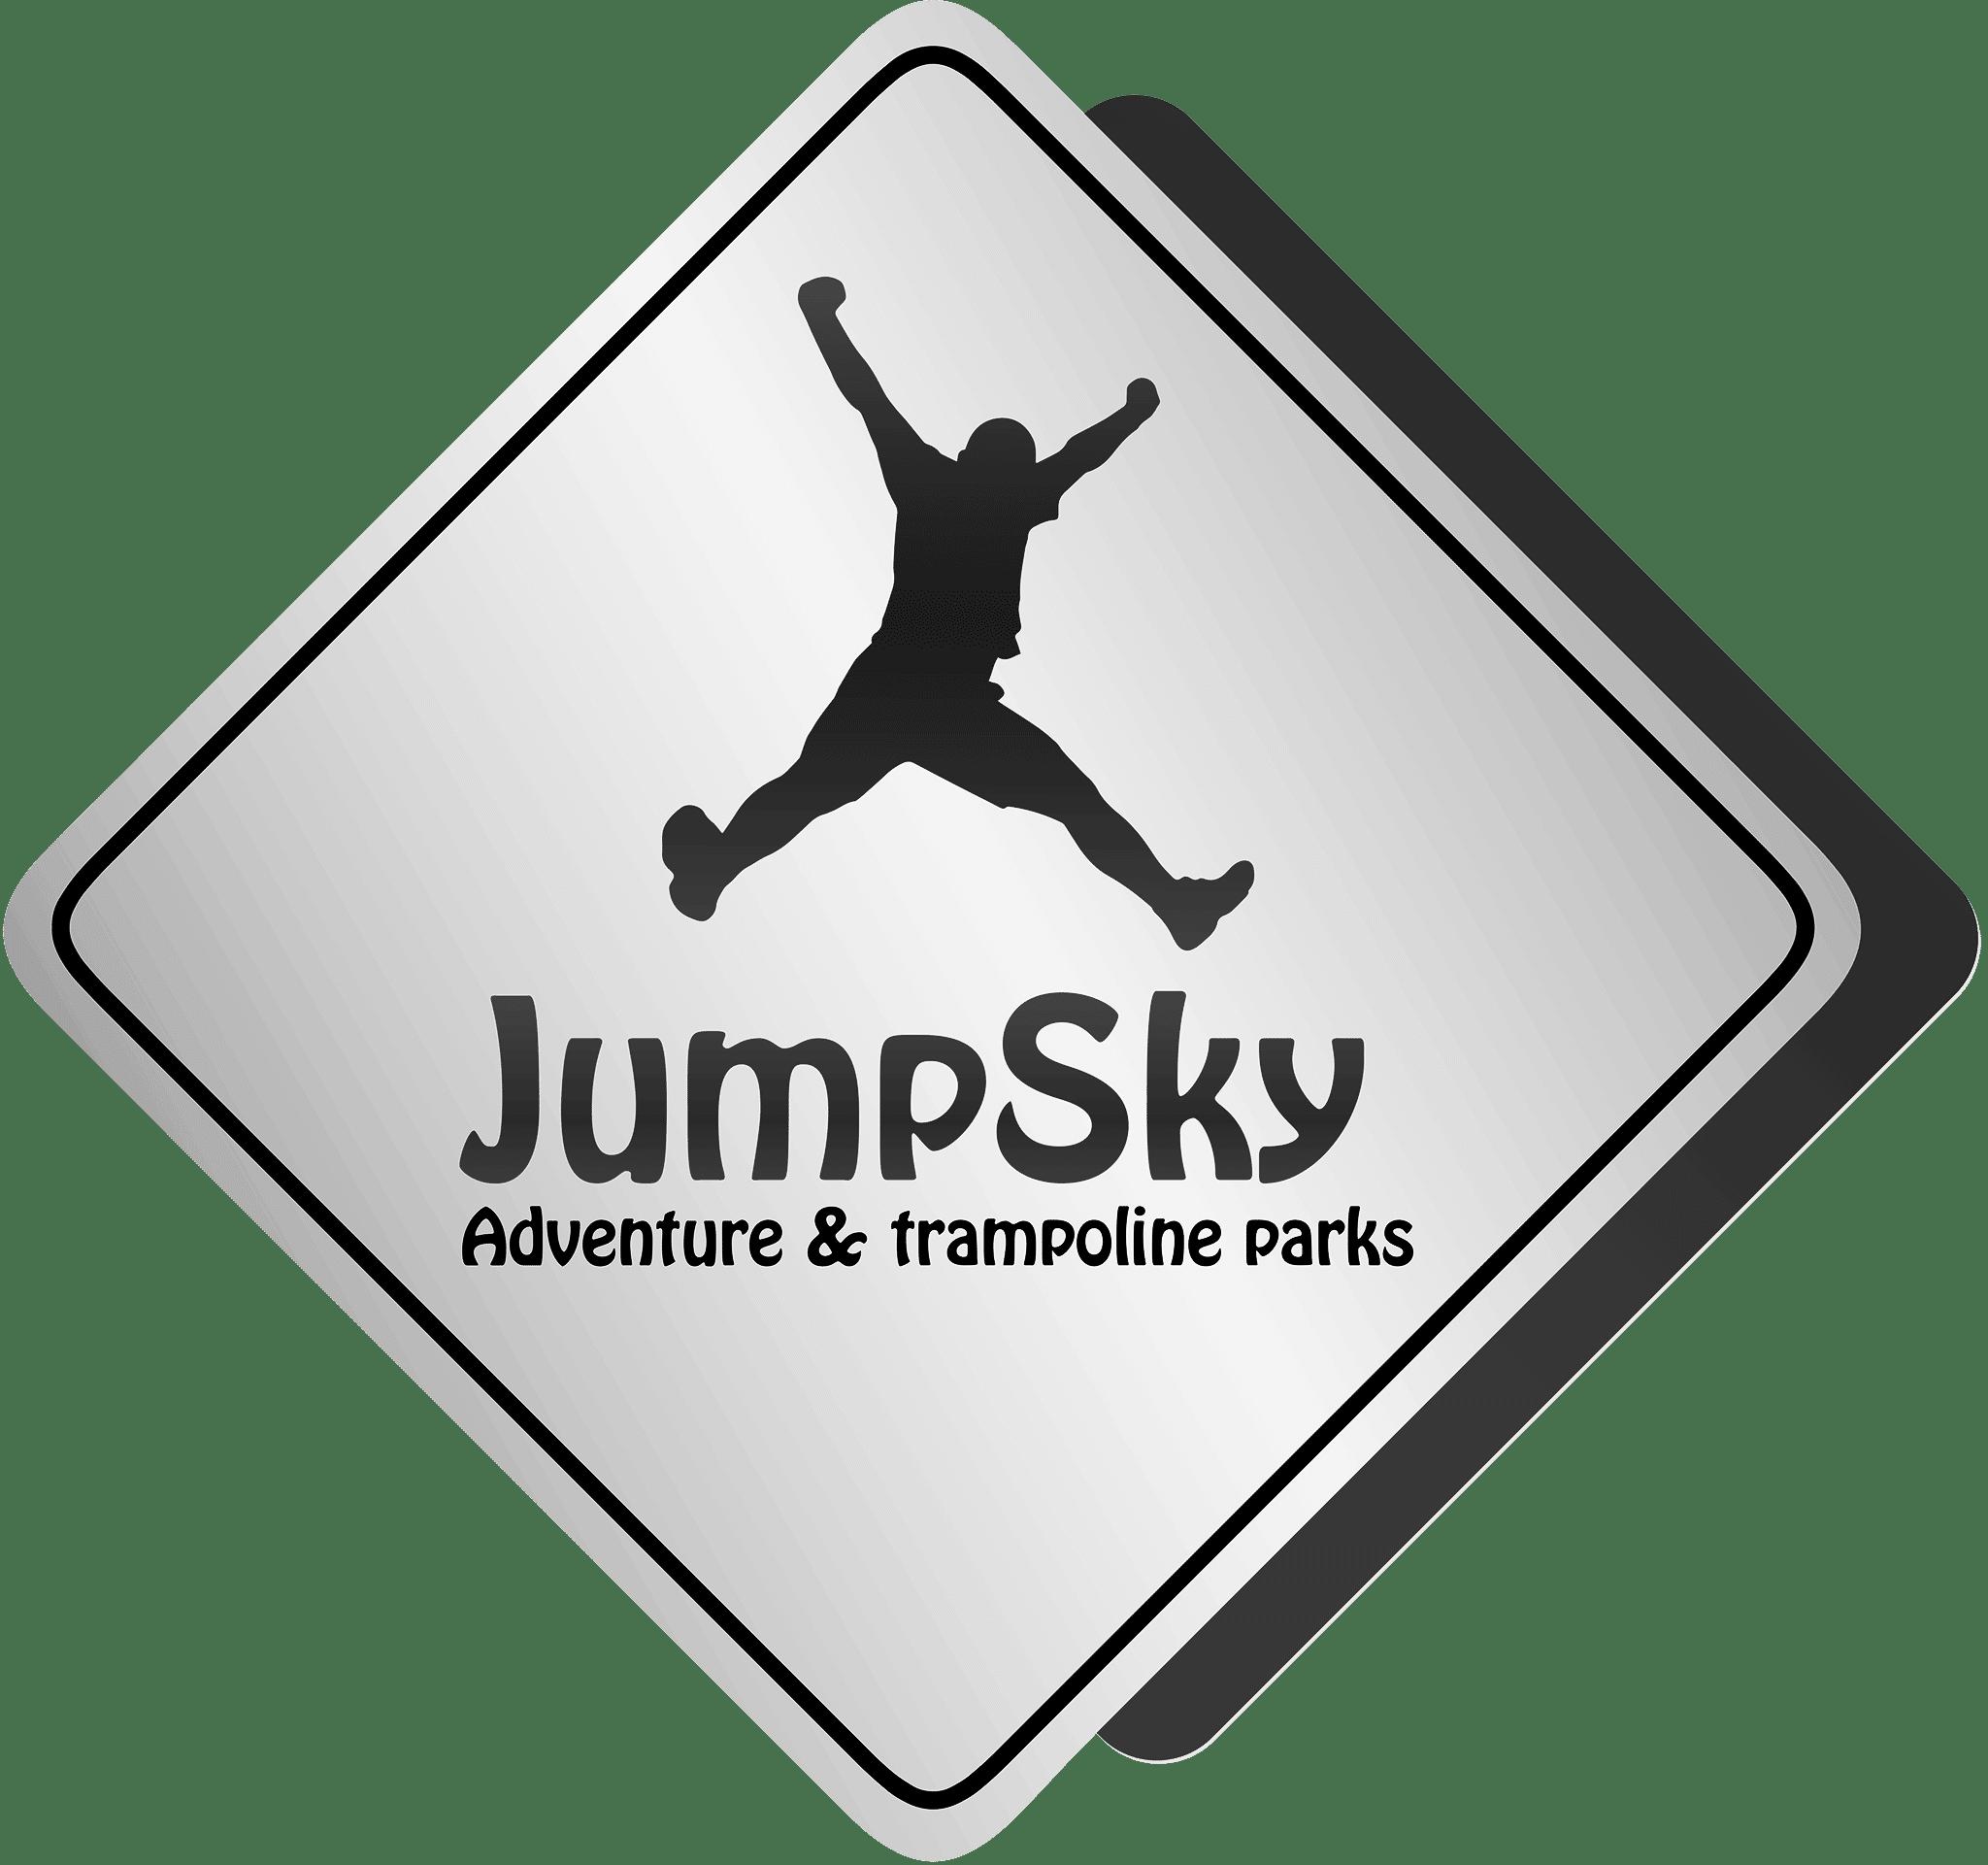 Jumpsky